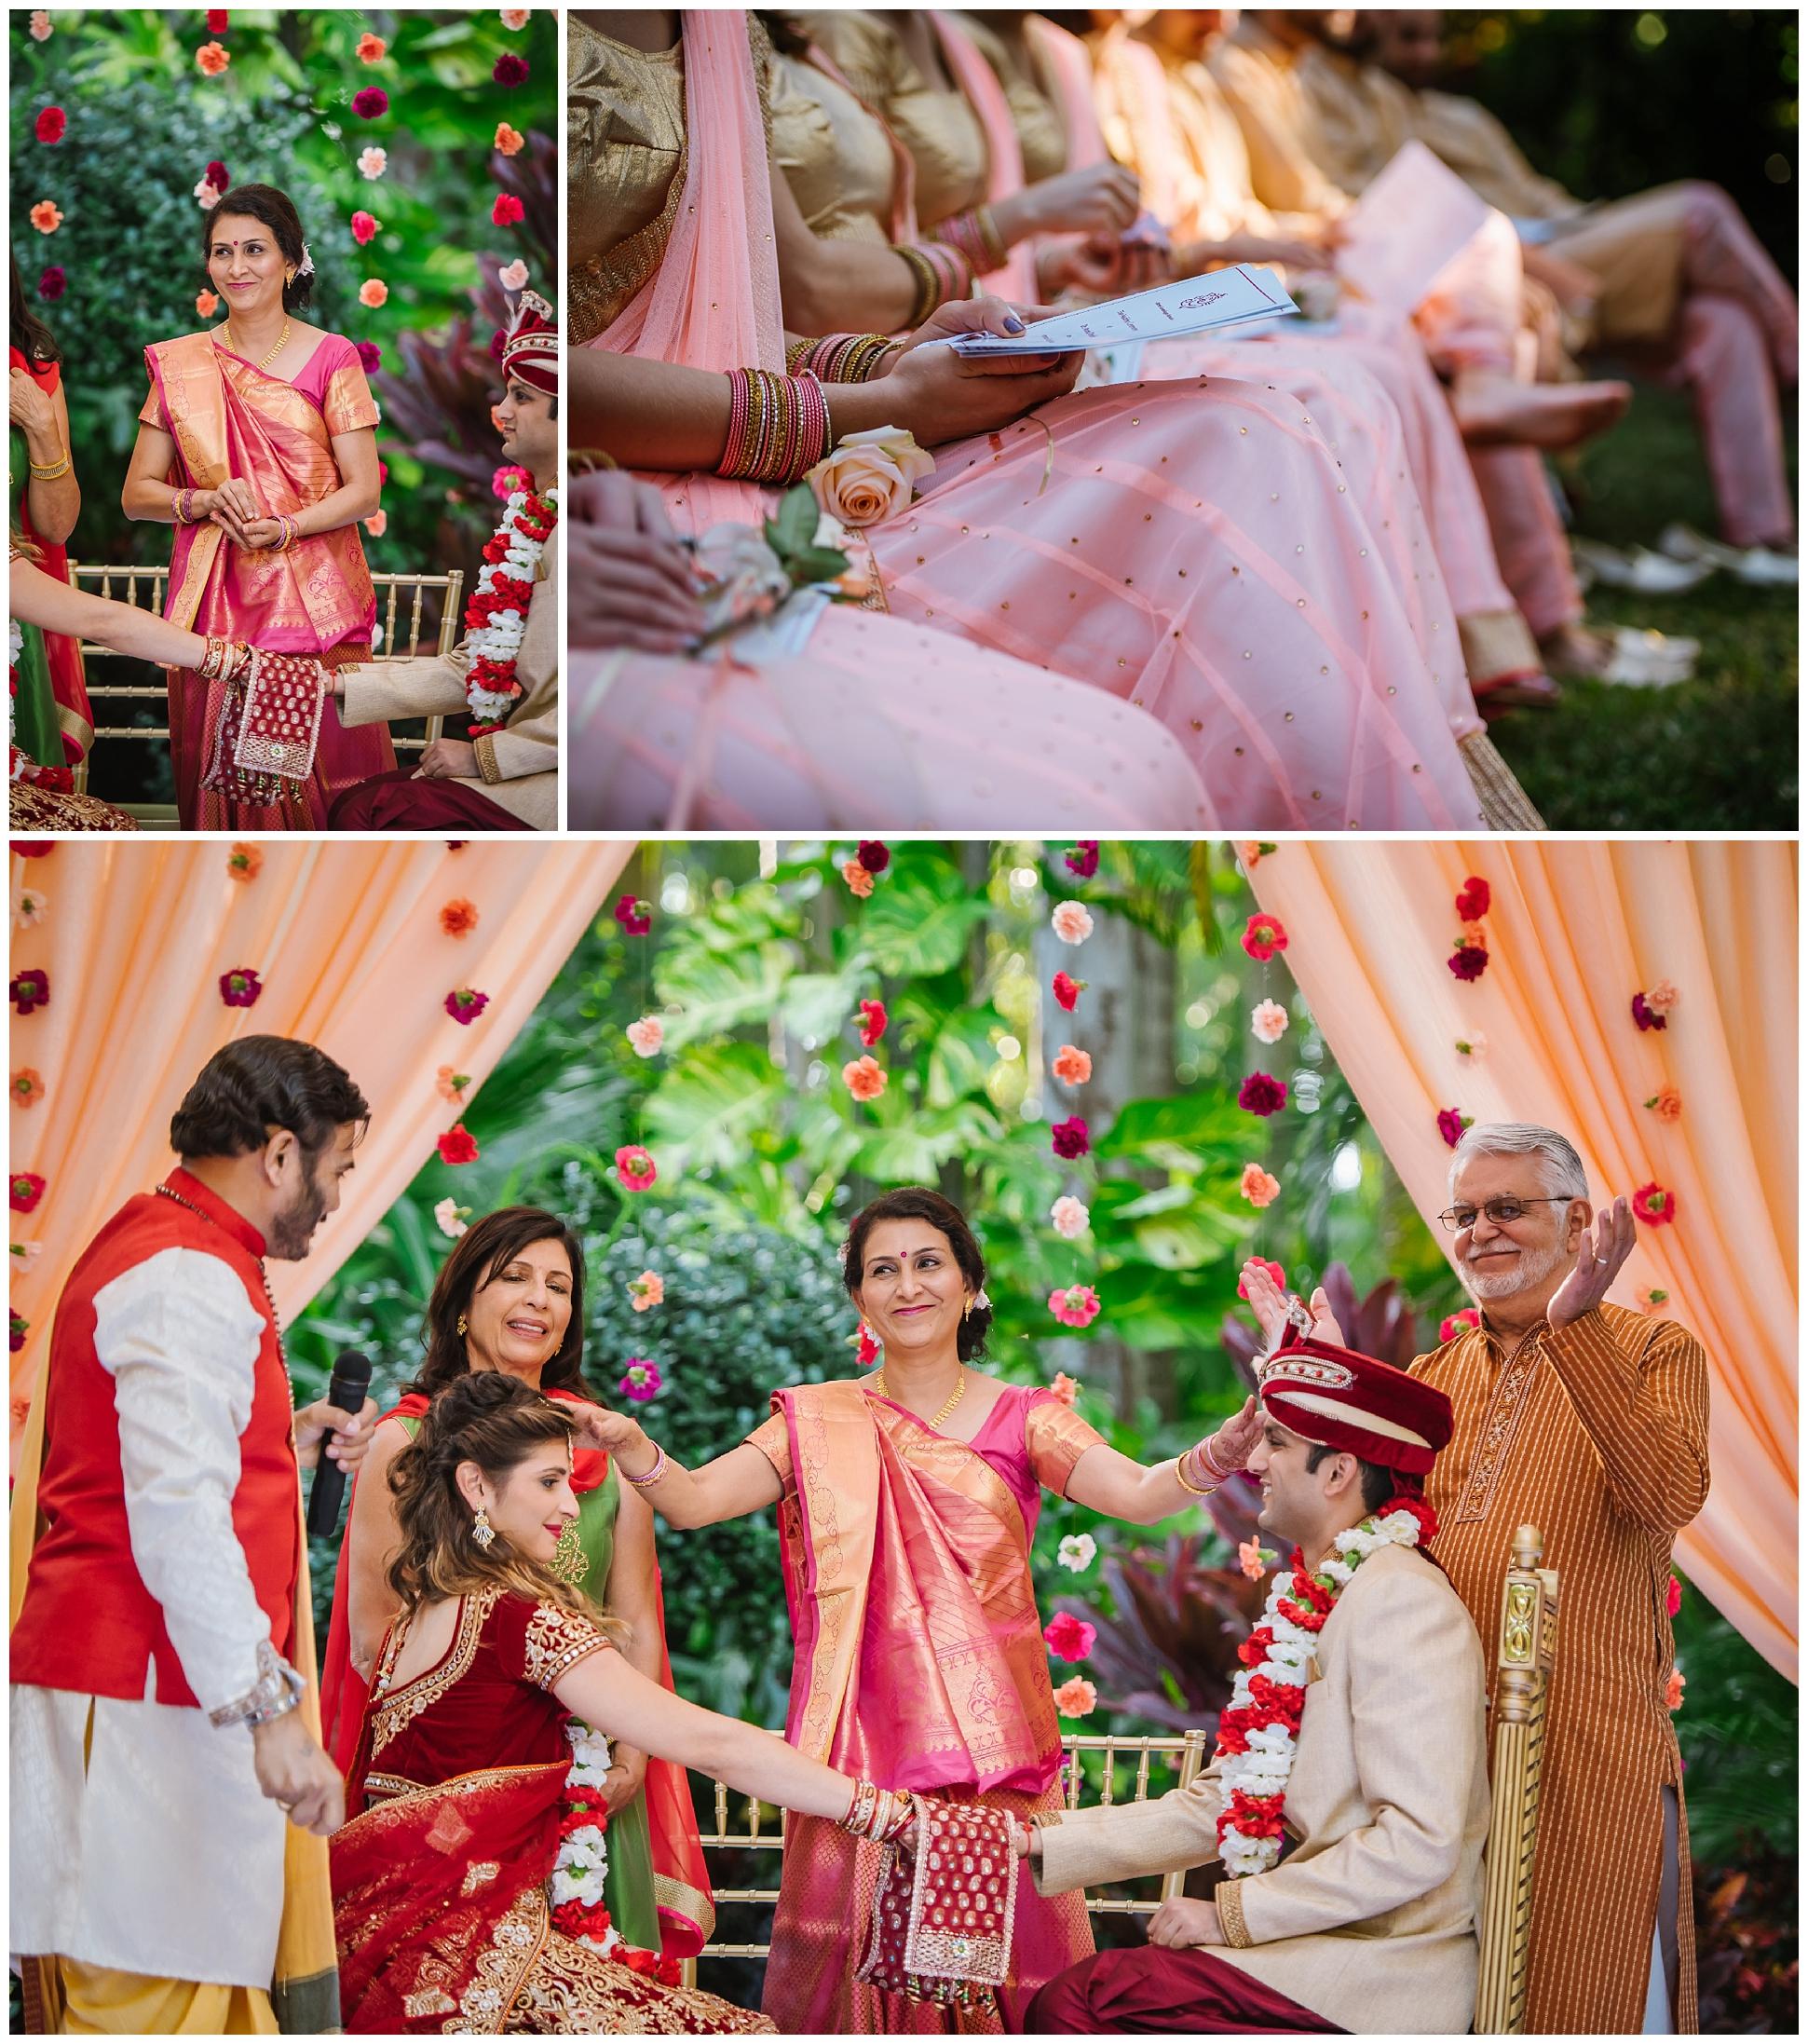 St-pete-indian-wedding-photographer-barat-sunken-gardens_0114.jpg